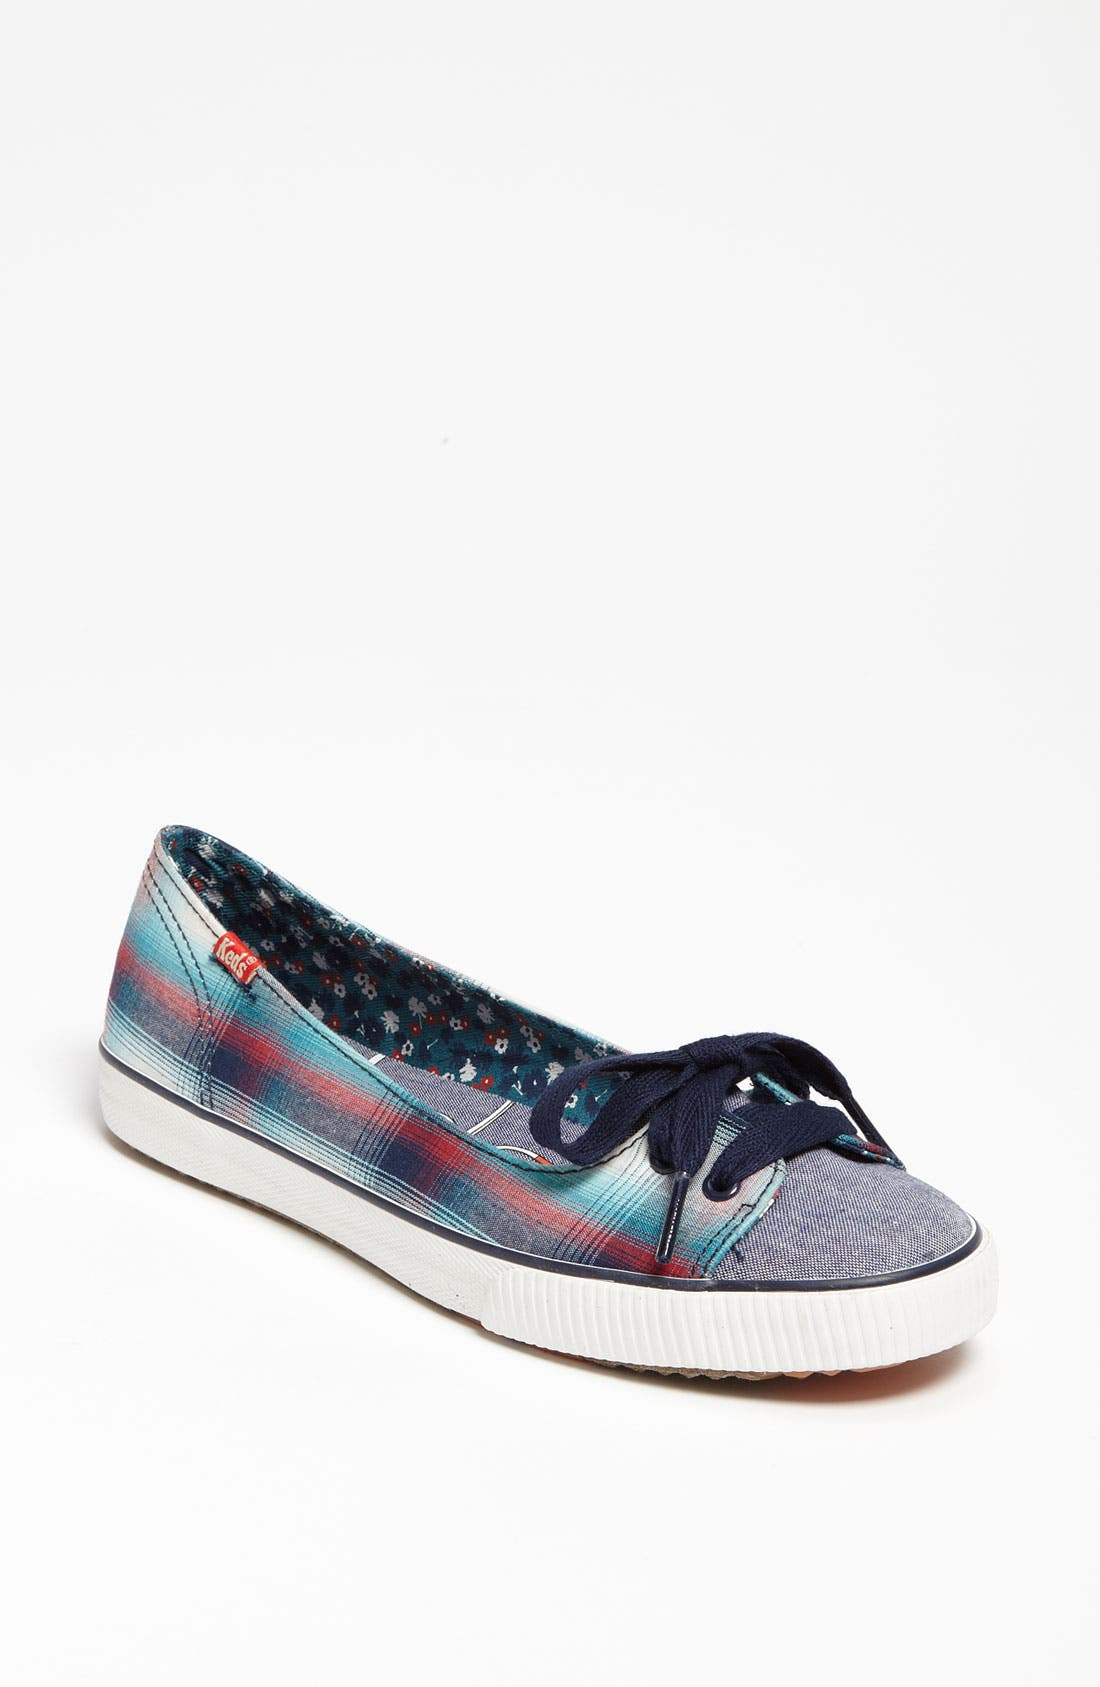 Alternate Image 1 Selected - Keds® 'Celeb' Sneaker